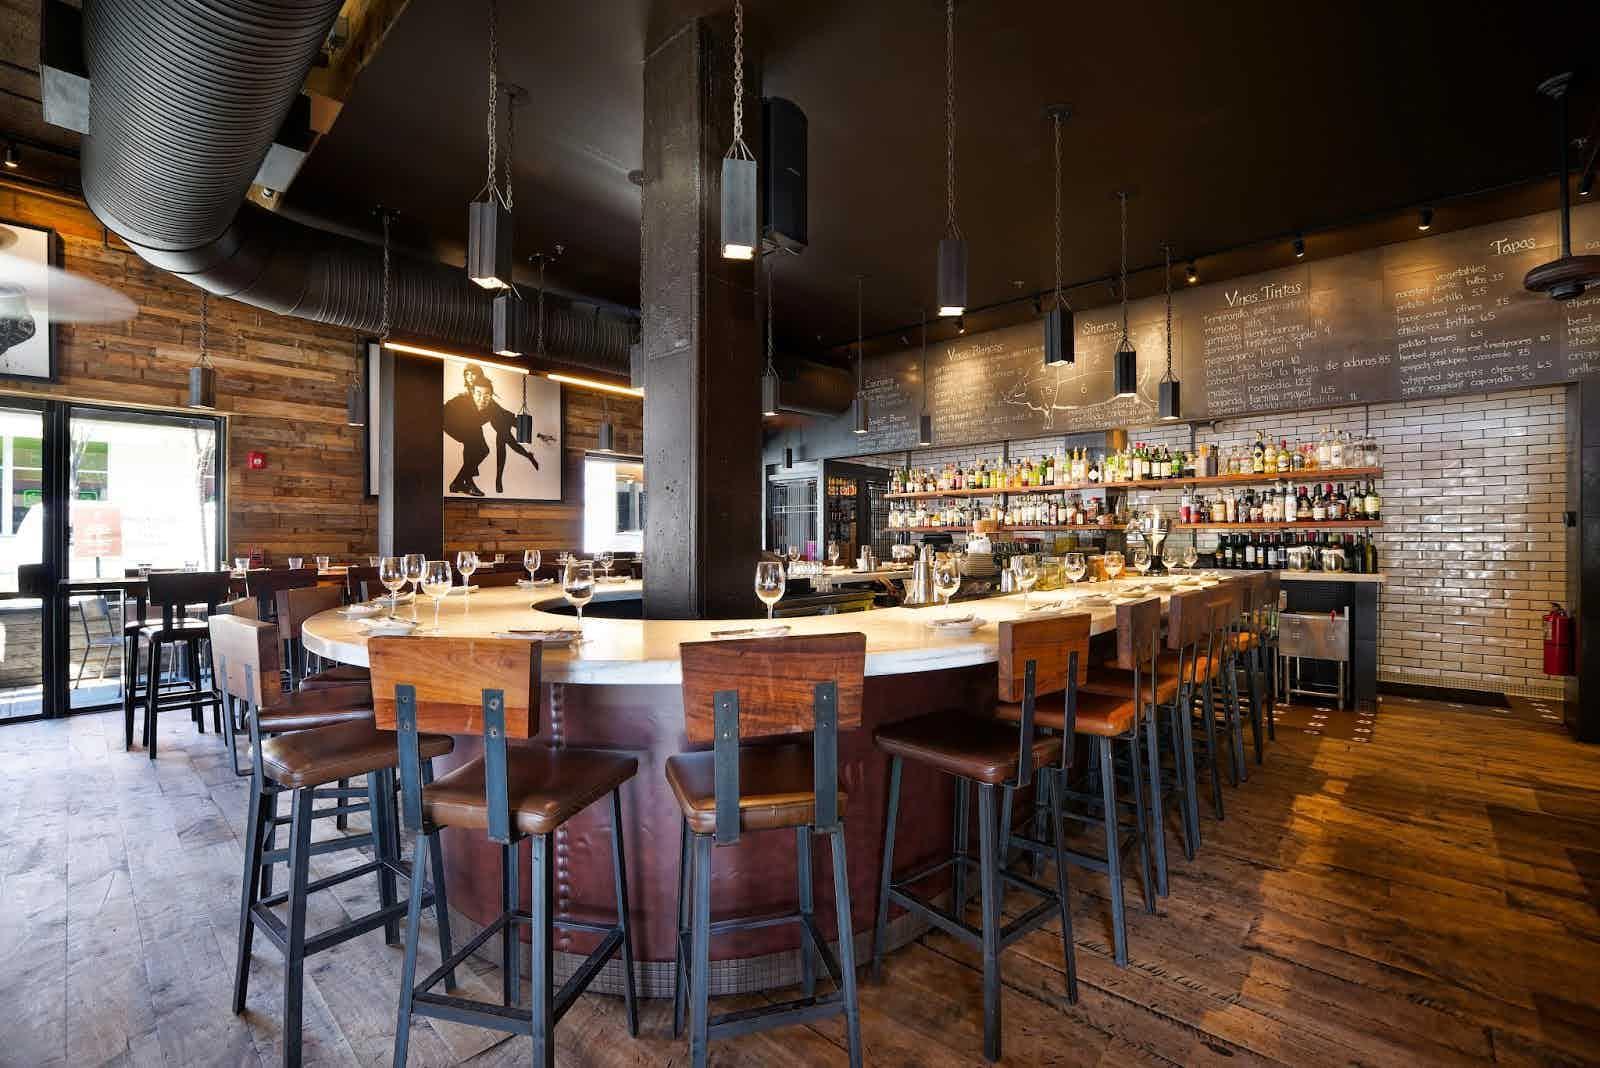 Barcelona Wine Bar Inman Park Atlanta Restaurant Review Zagat